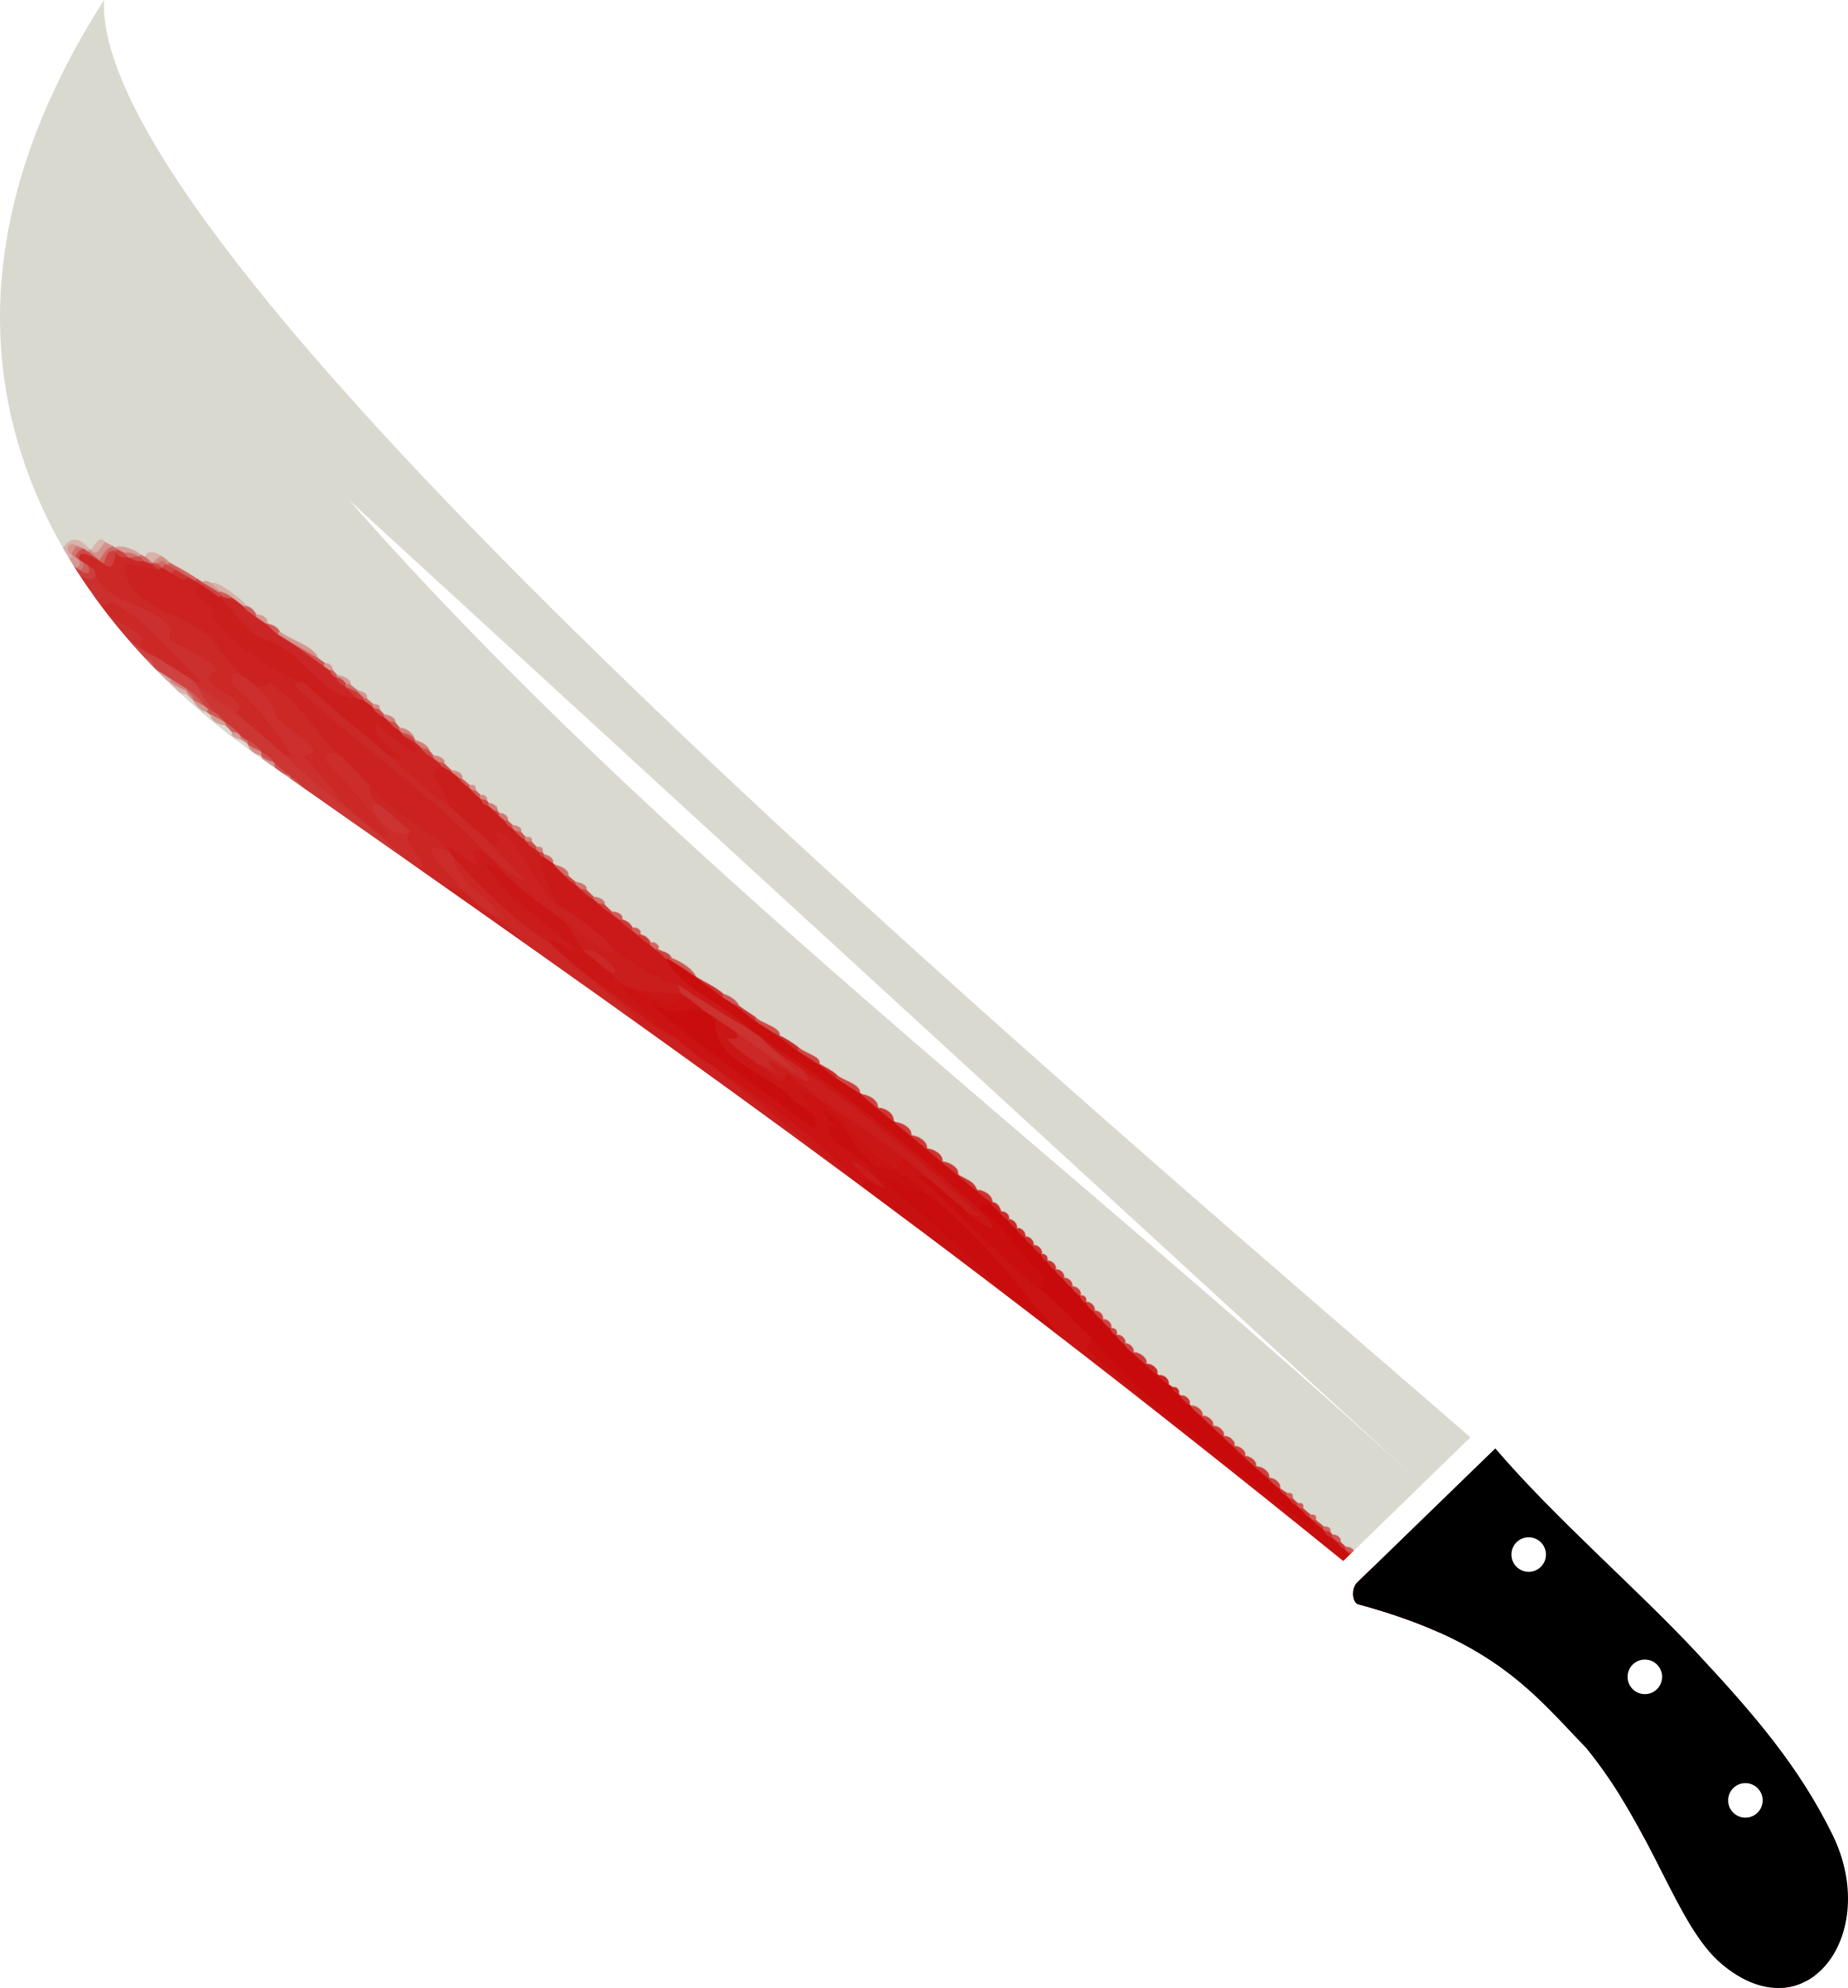 svg transparent download Guns clipart knife. Machete free on dumielauxepices